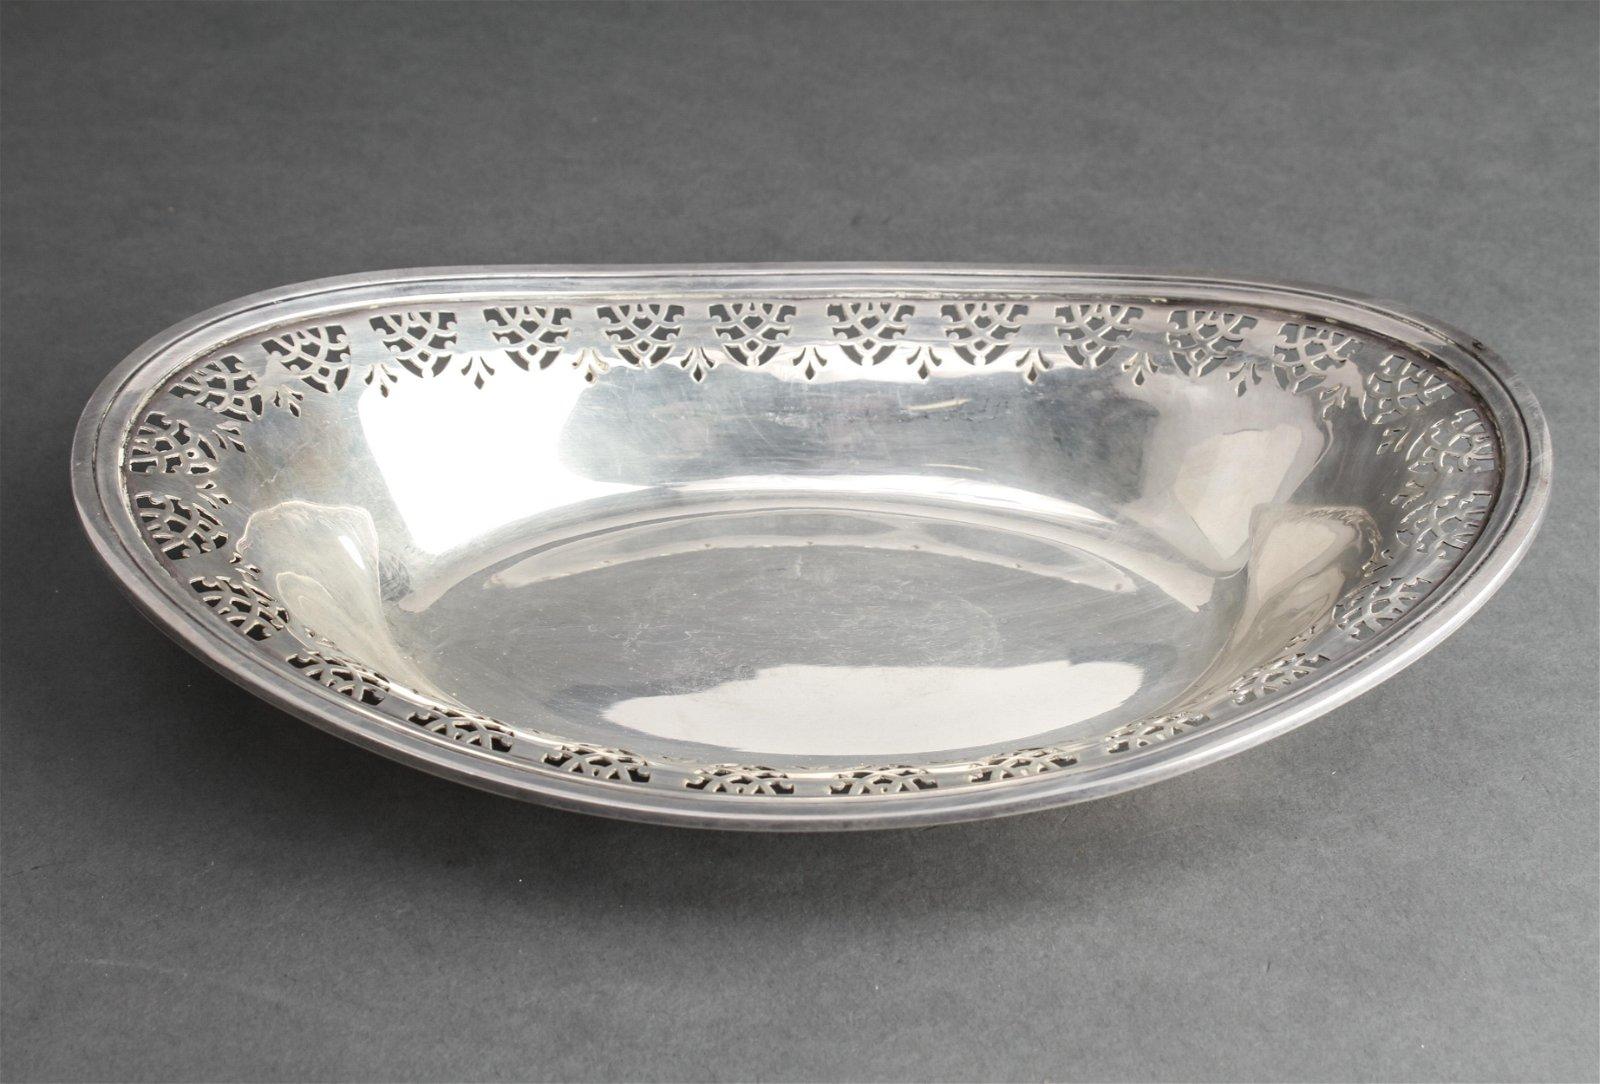 Tiffany & Co. Sterling Silver Pierced Oblong Bowl